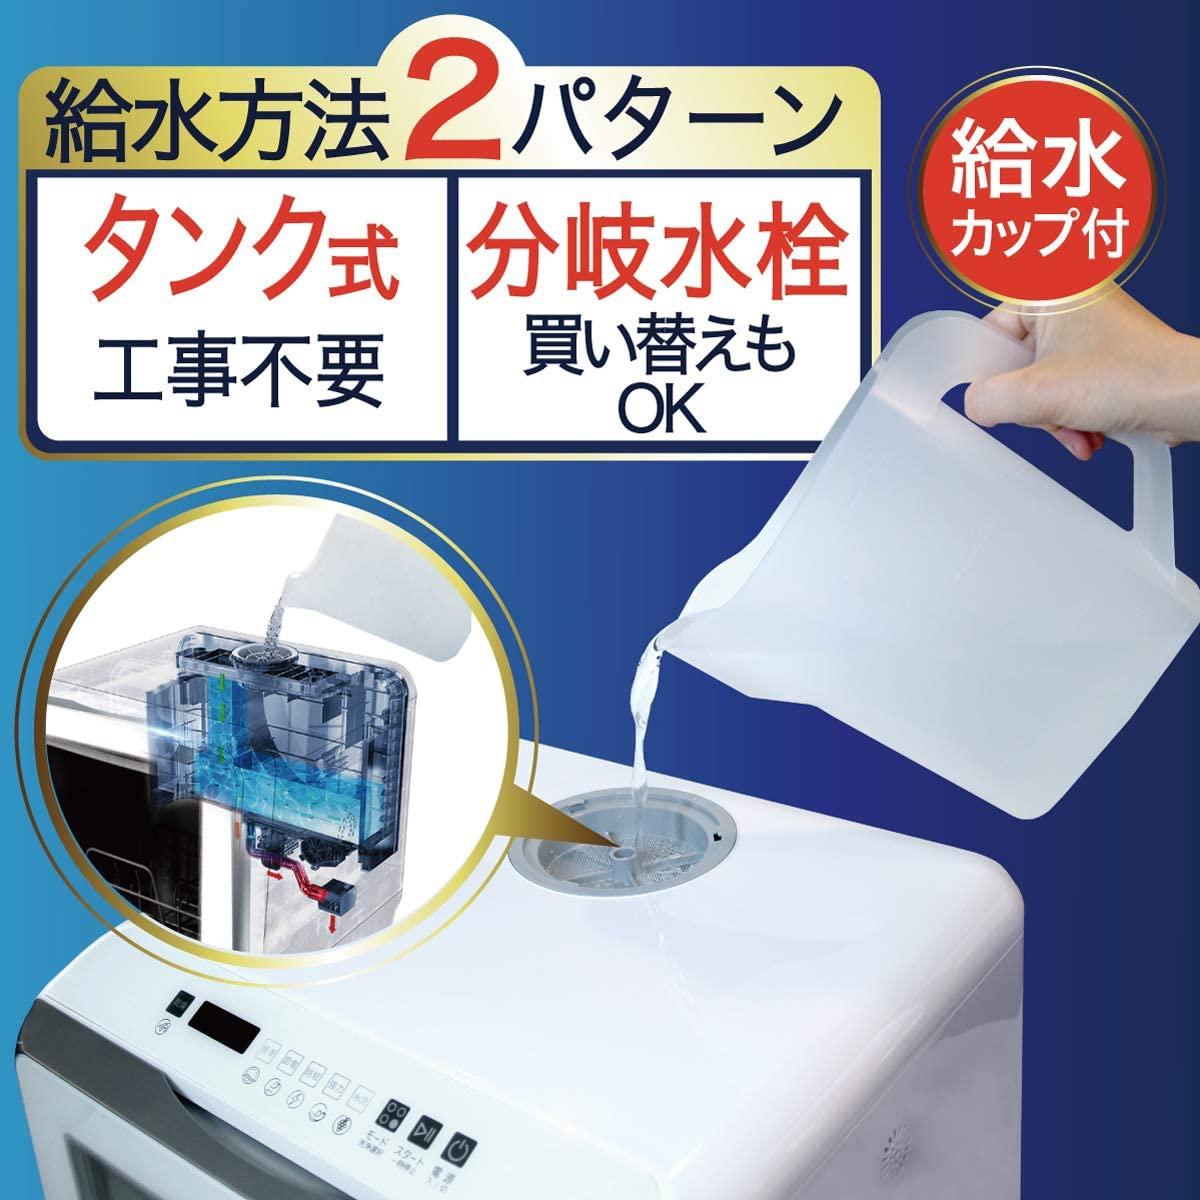 SOUYI(ソウイ) 食器洗い乾燥機 SY-118の商品画像3